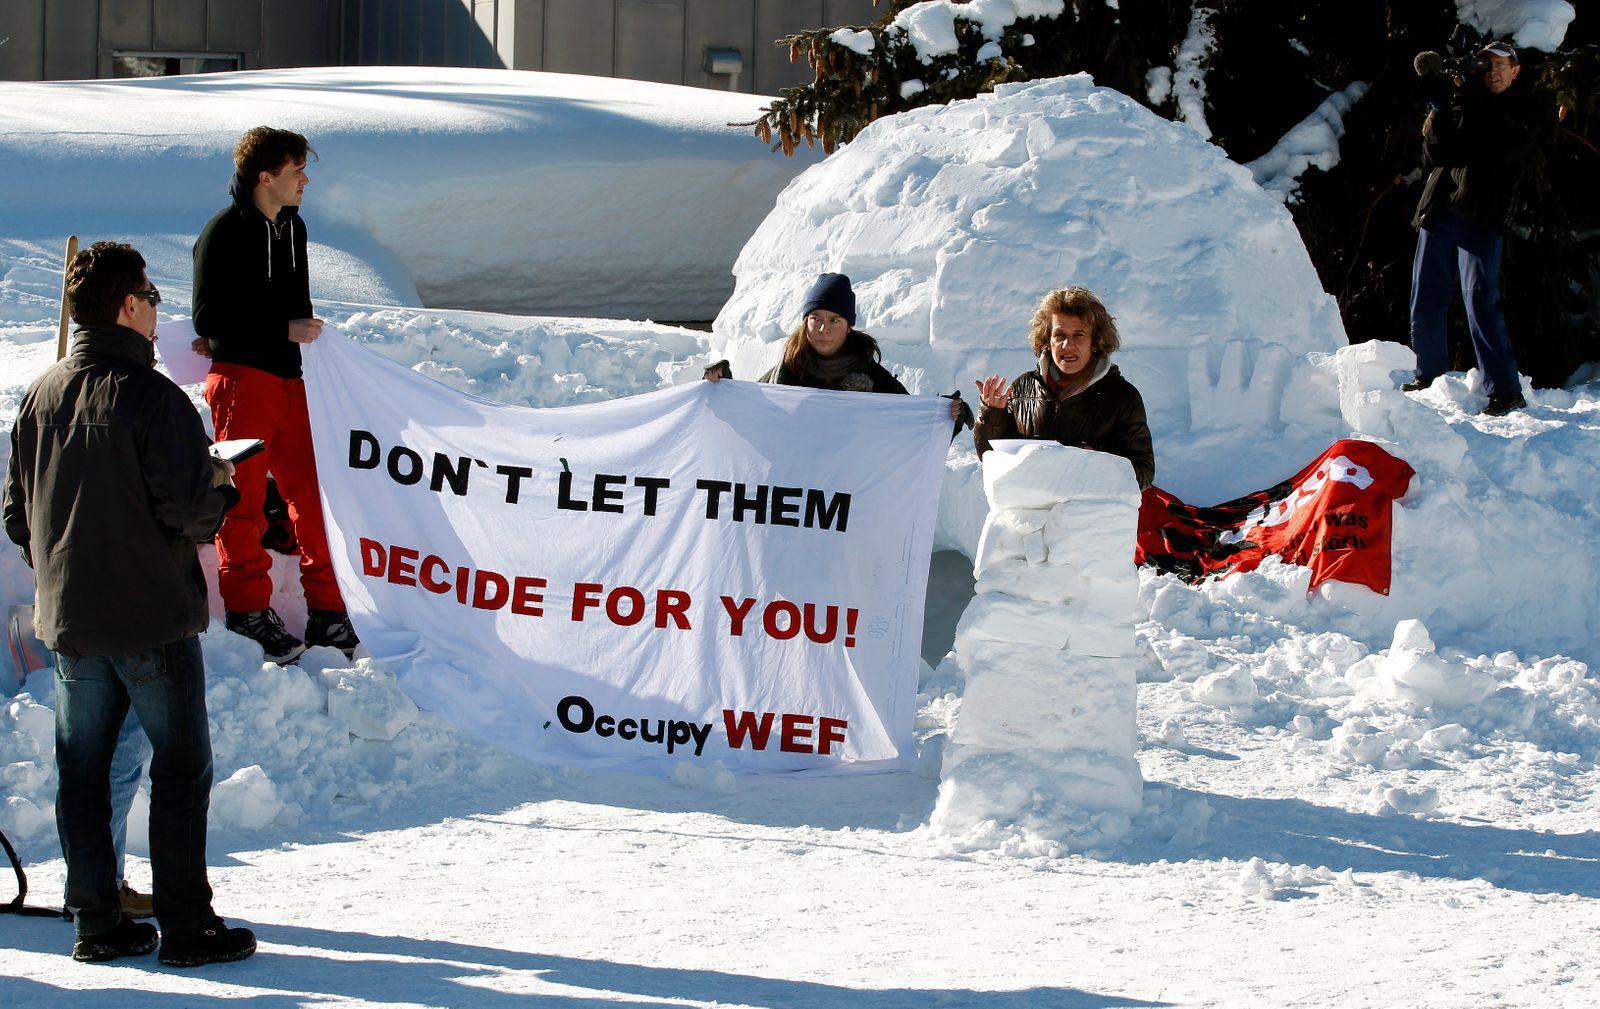 Schweiz / Davos / Iglu / Proteste / Occupy WEF